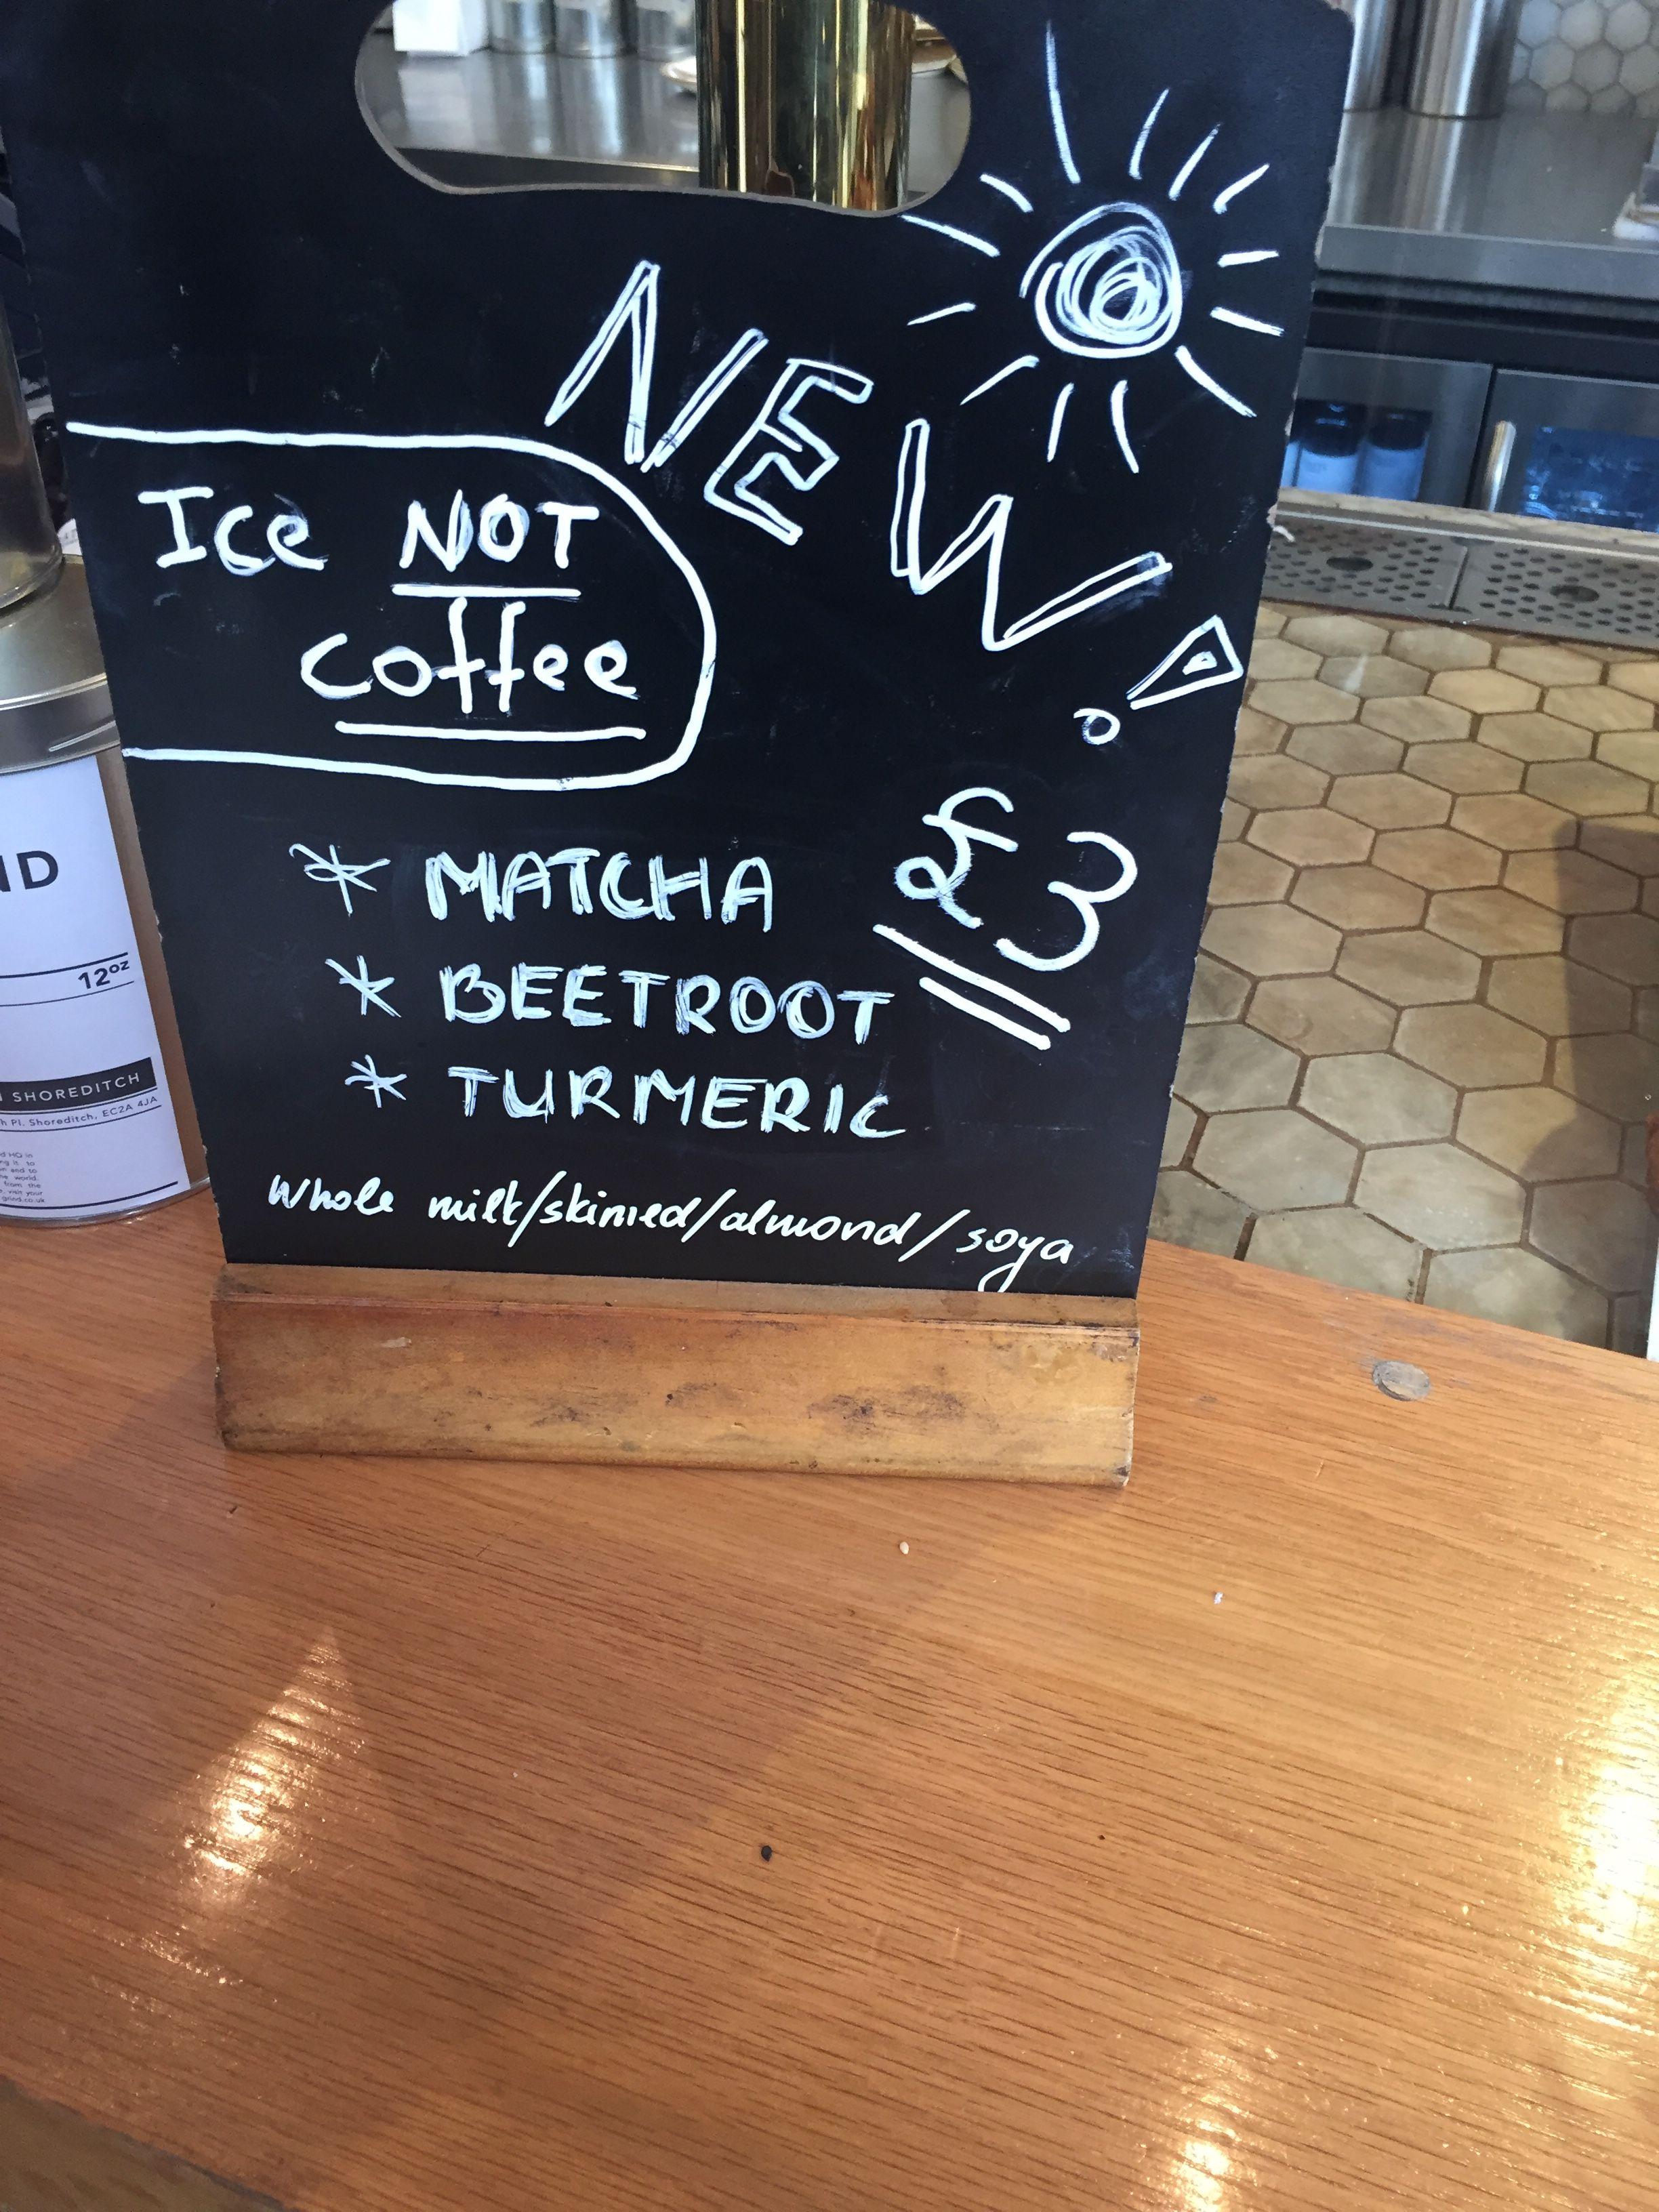 Beetroot latte?!??